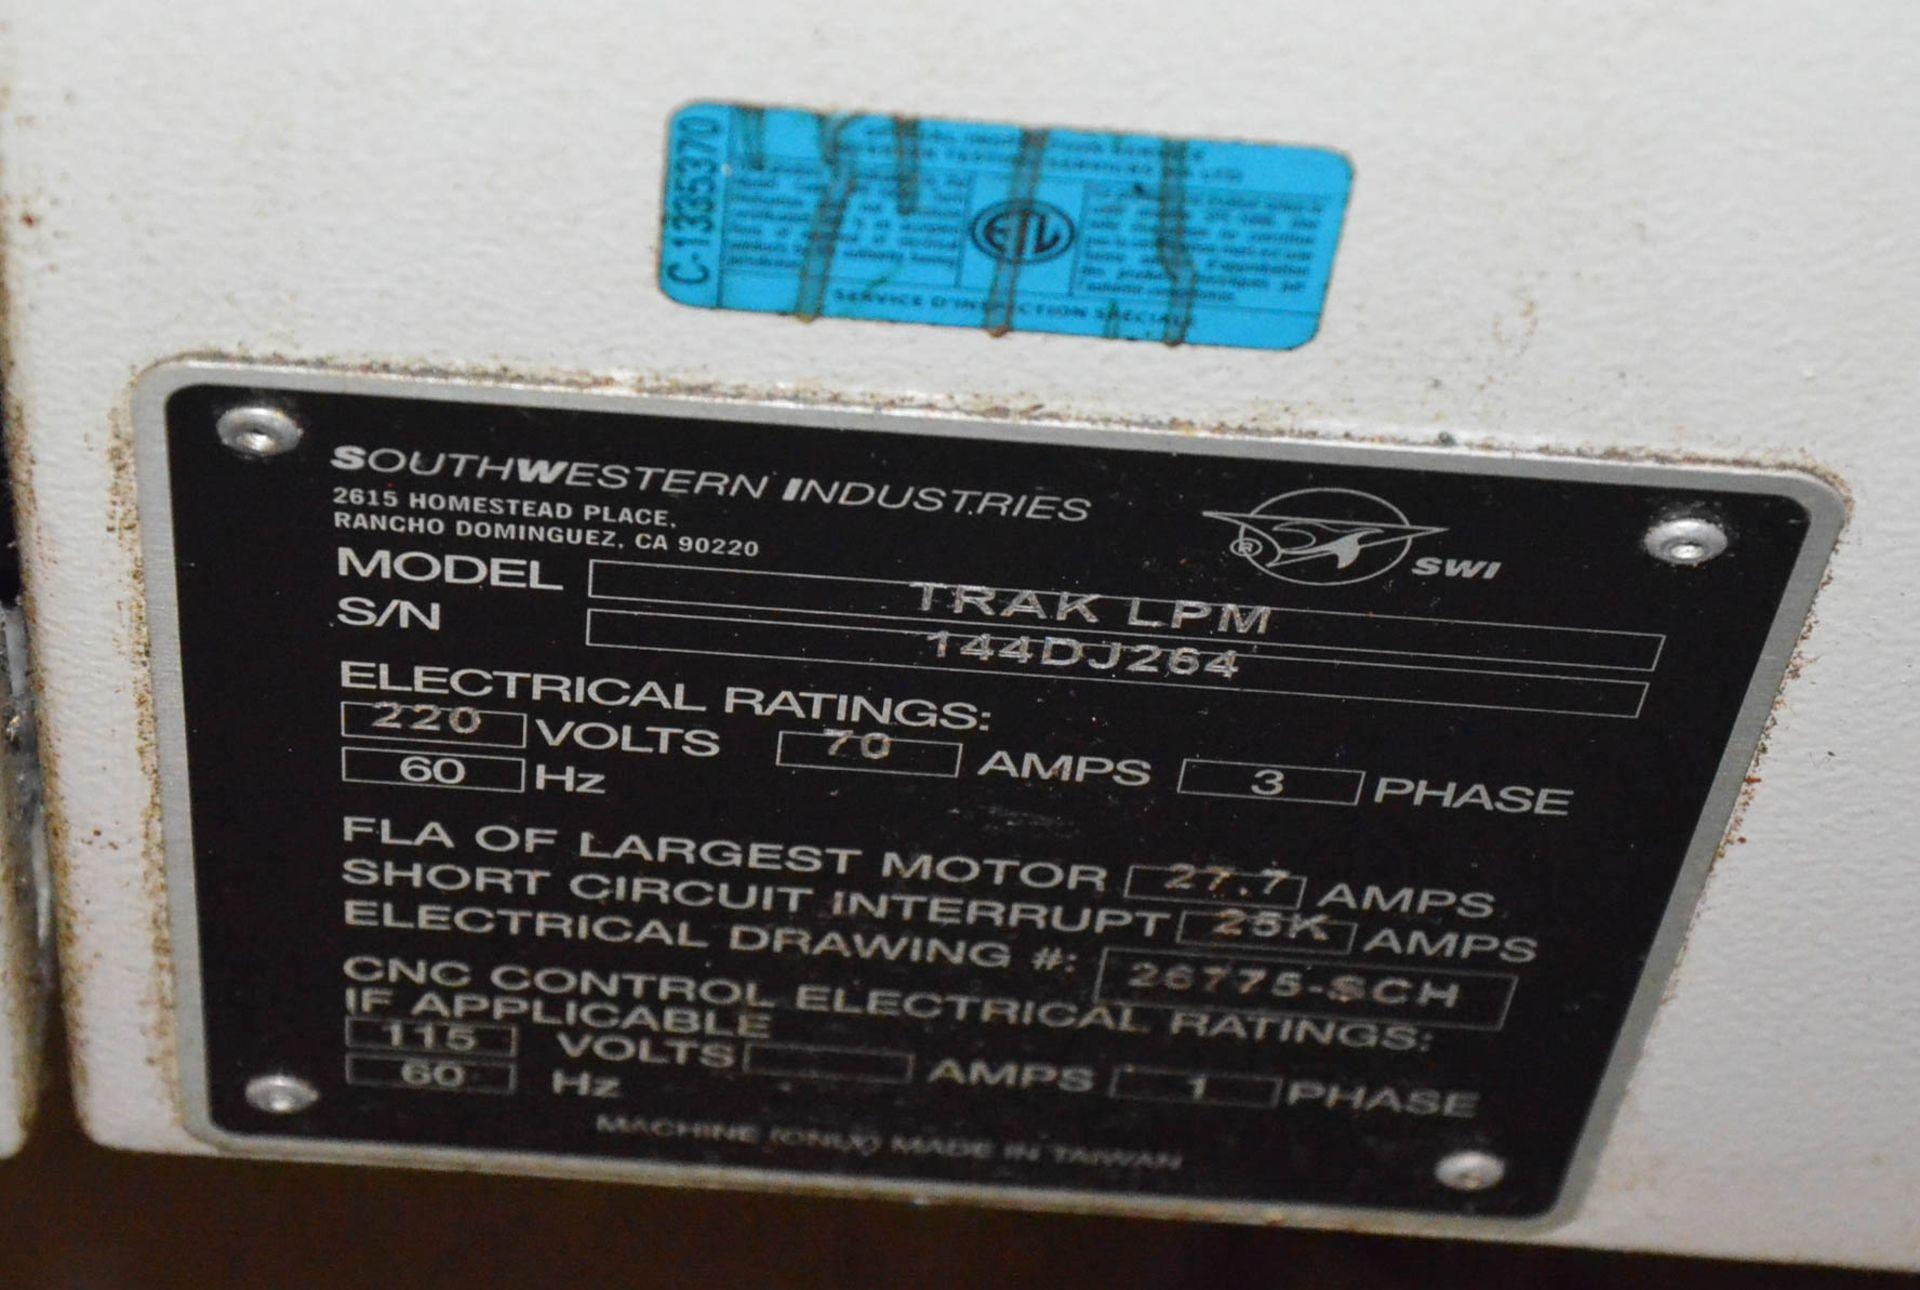 "SWI (2013) TRAK LPM CNC VERTICAL MACHINING CENTER WITH PROTO TRAK PMX CNC CONTROL, 19.5"" X 35.5"" - Image 4 of 9"